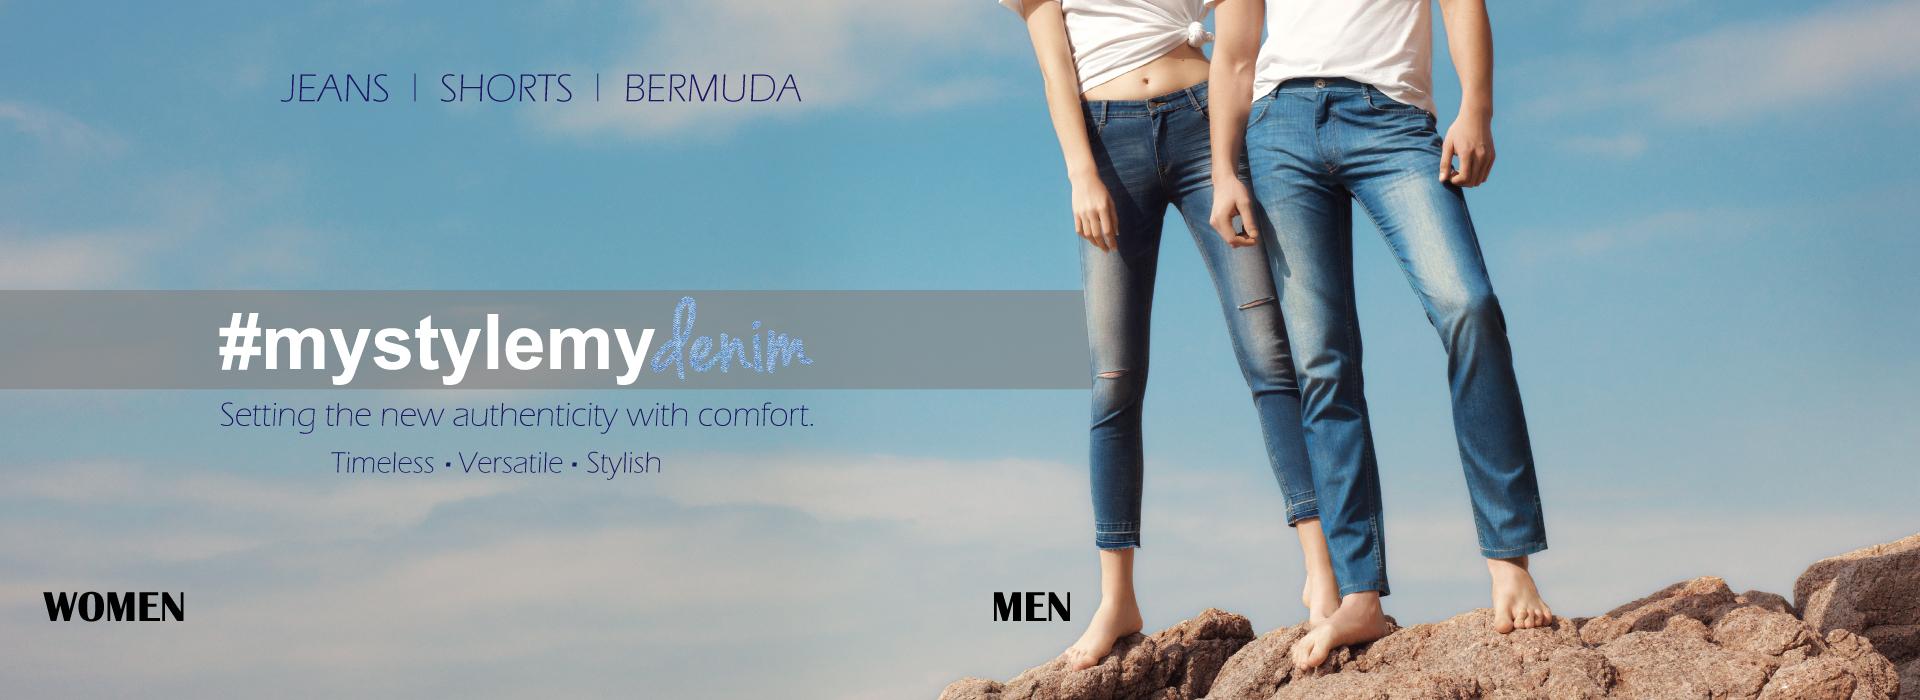 mystylemydenim jeans